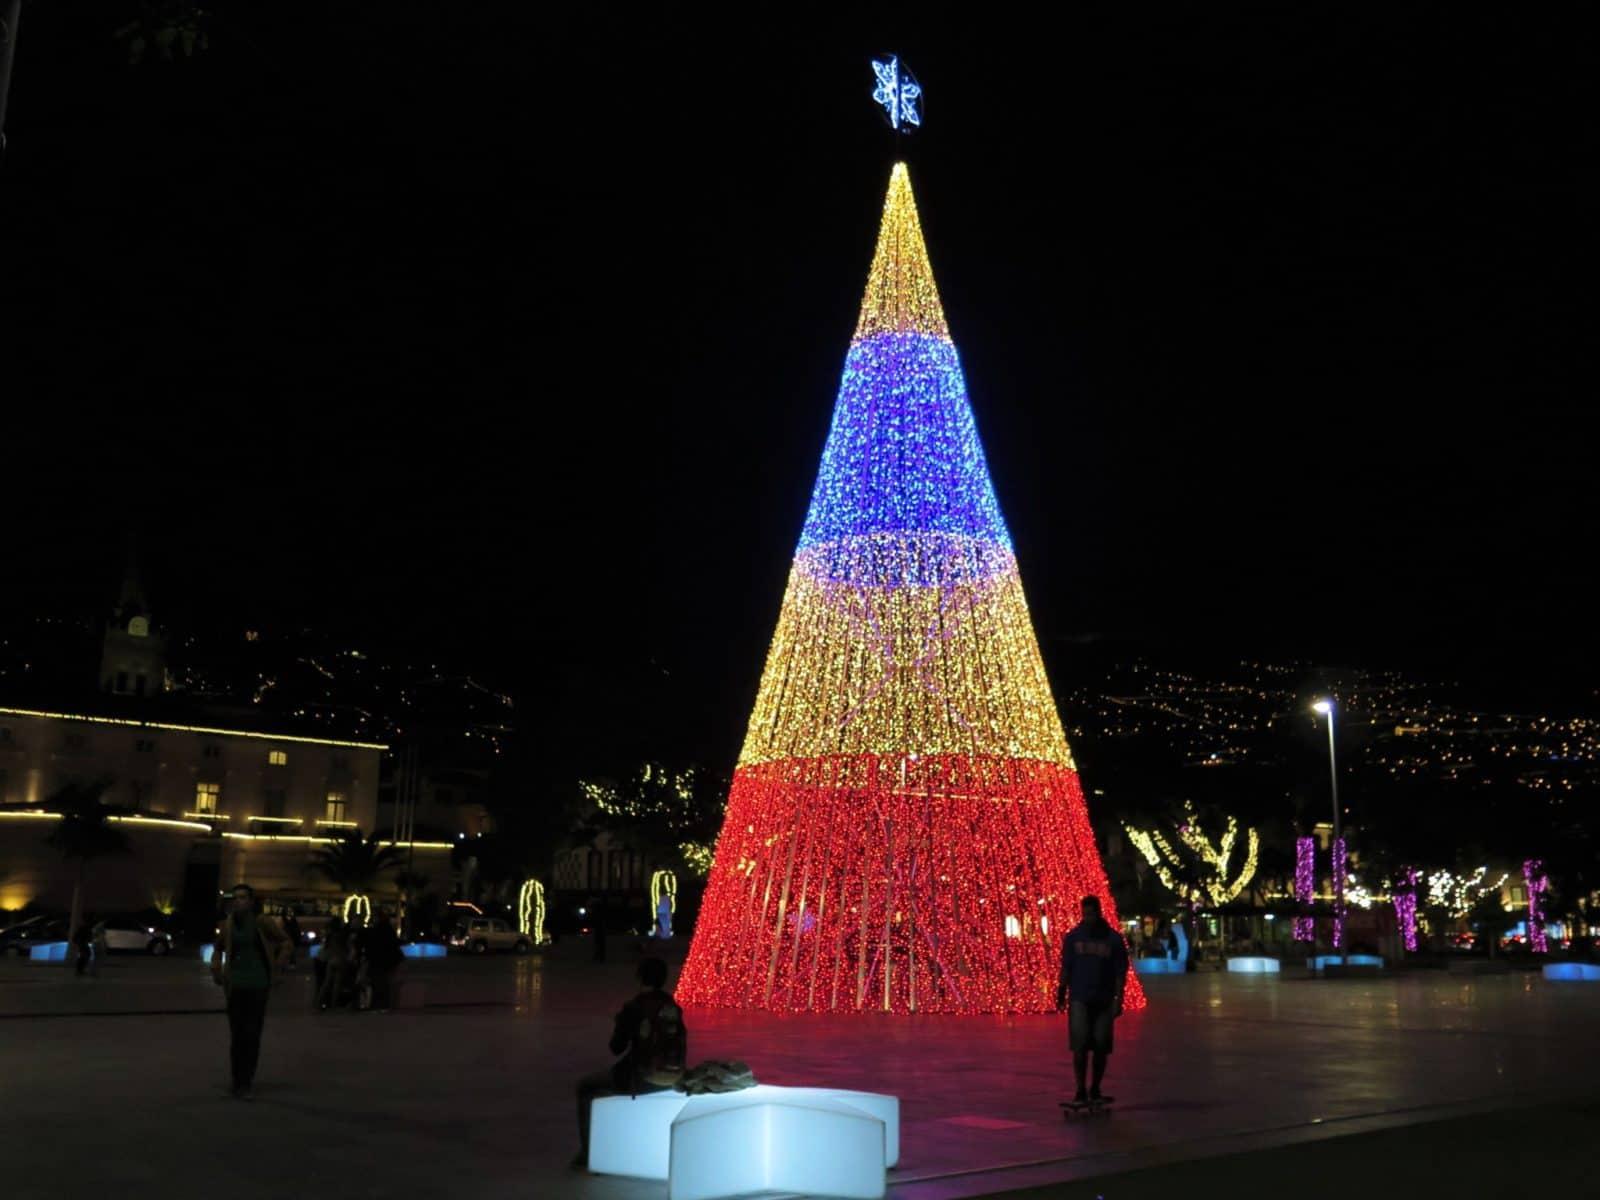 Hra svetiel, Funchal, Madeira, Jana Kristekova